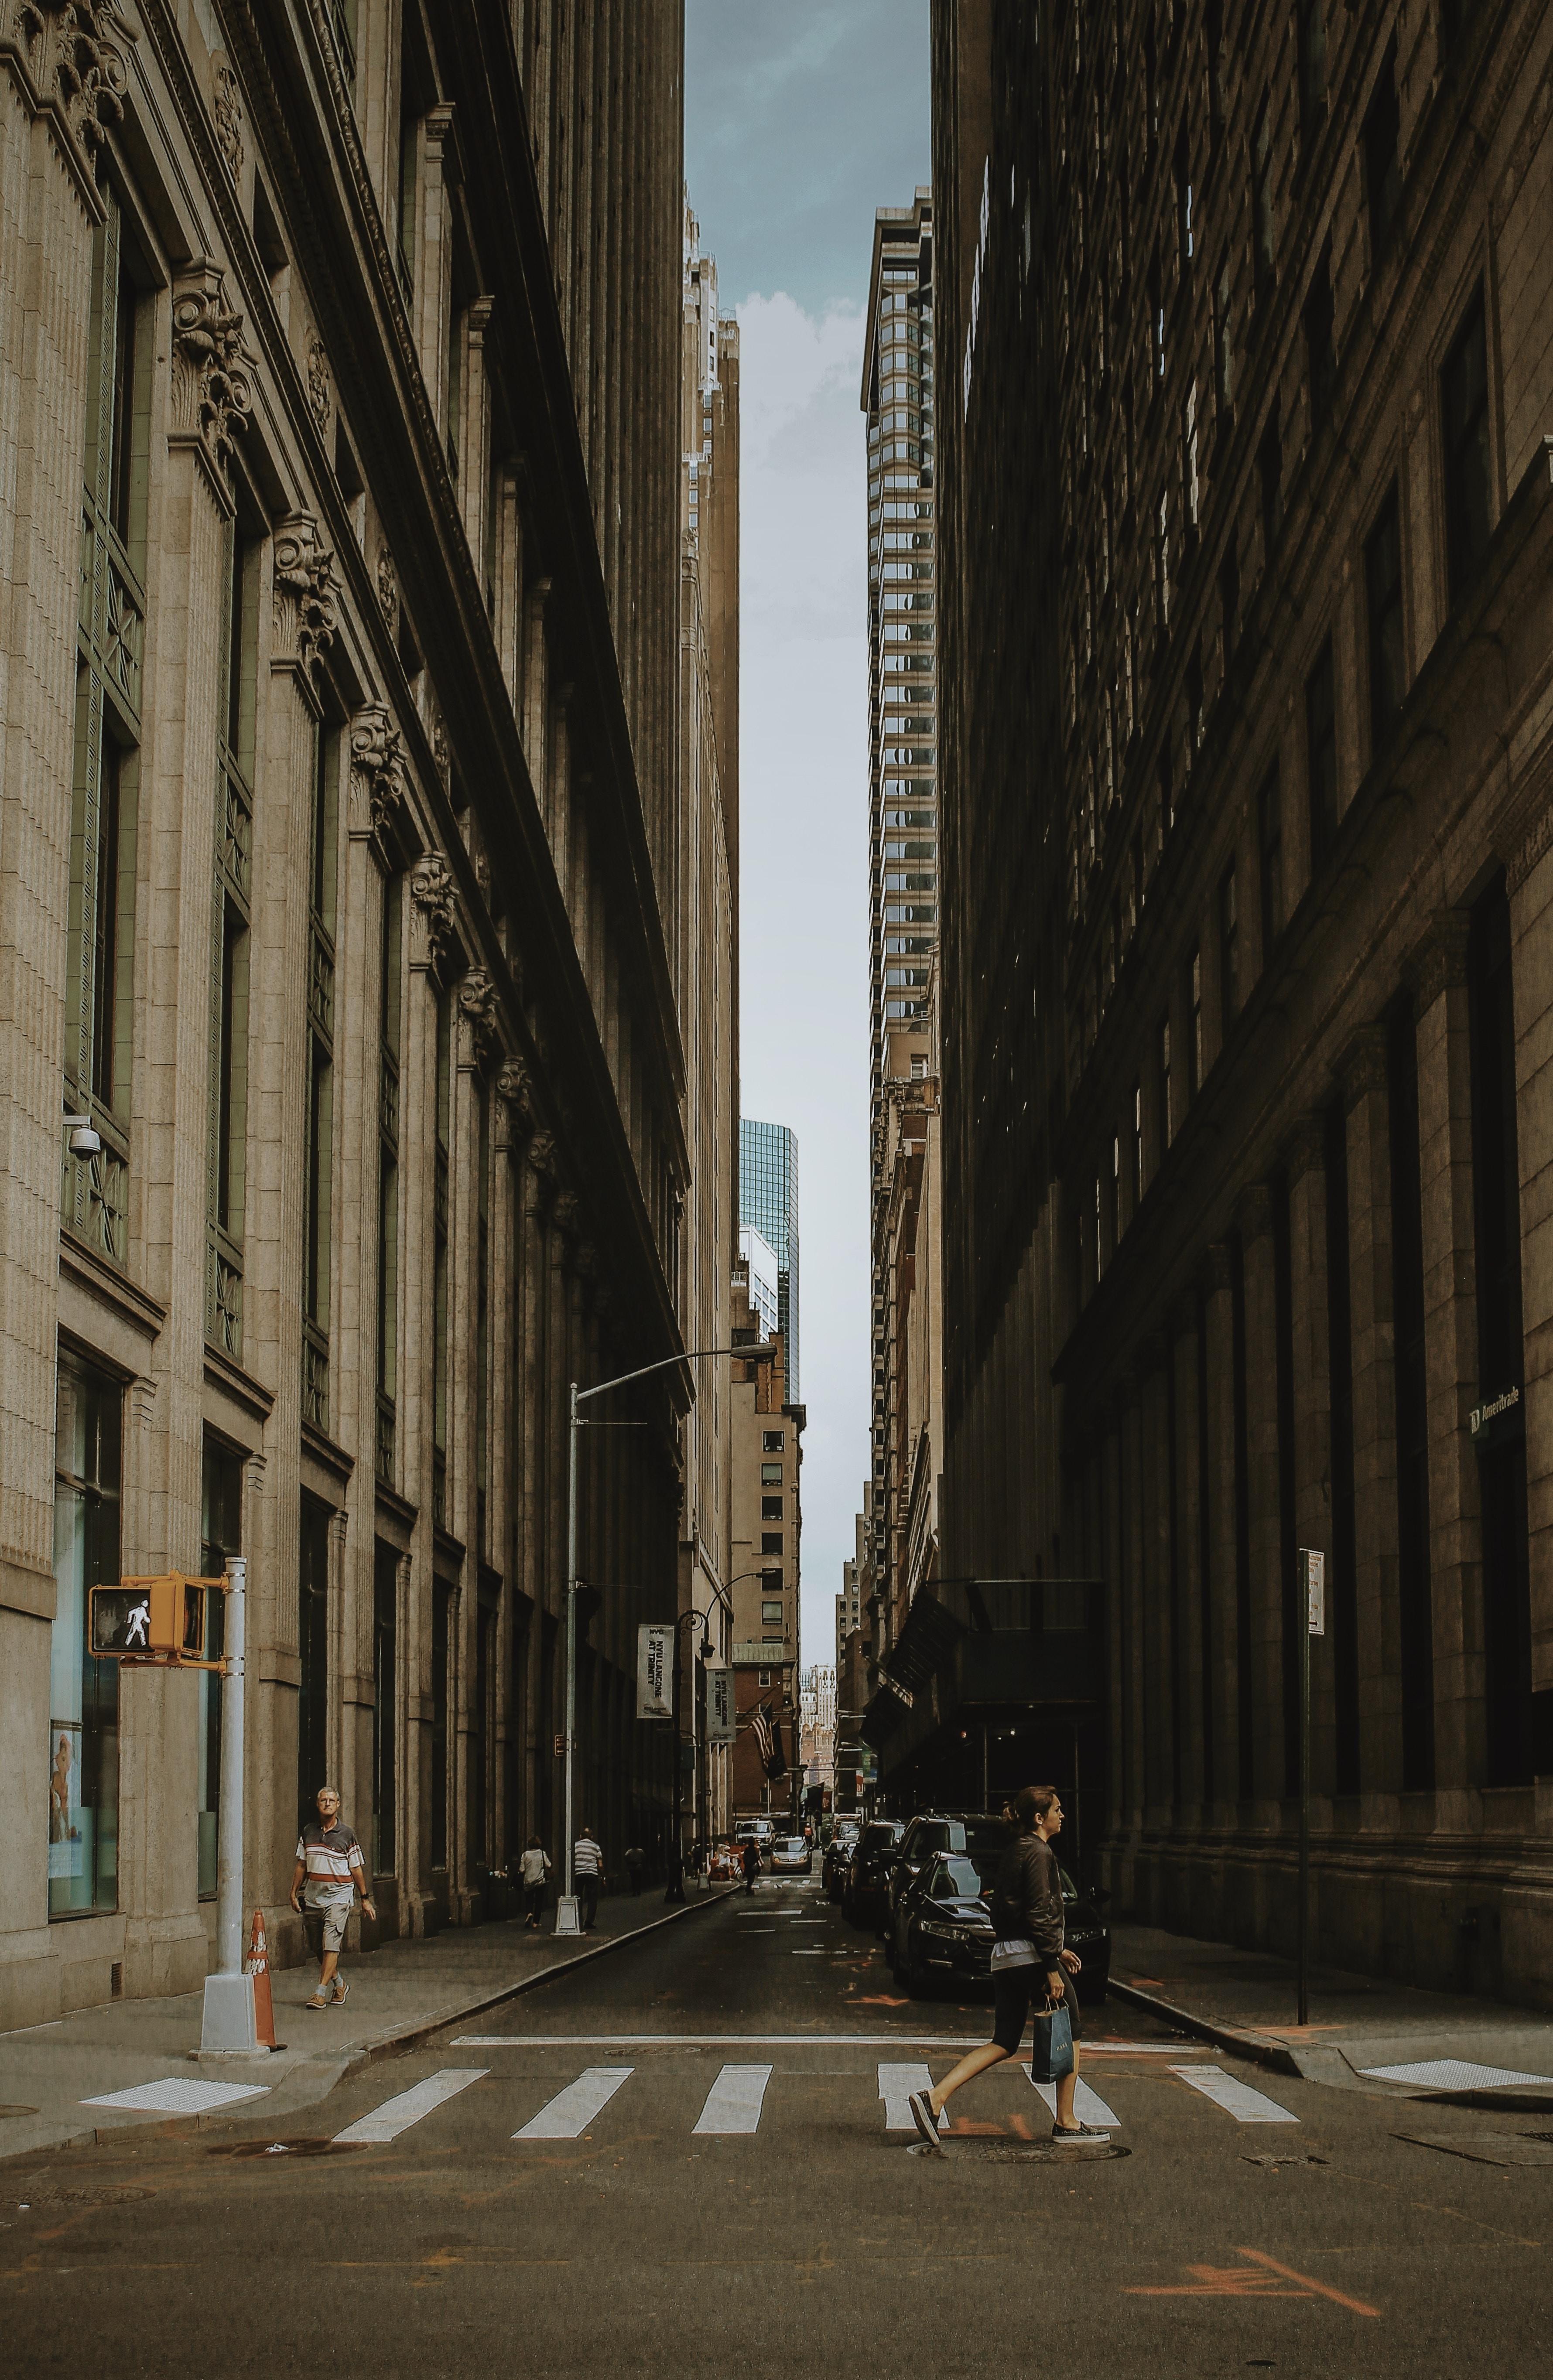 woman walking on street between building during daytime